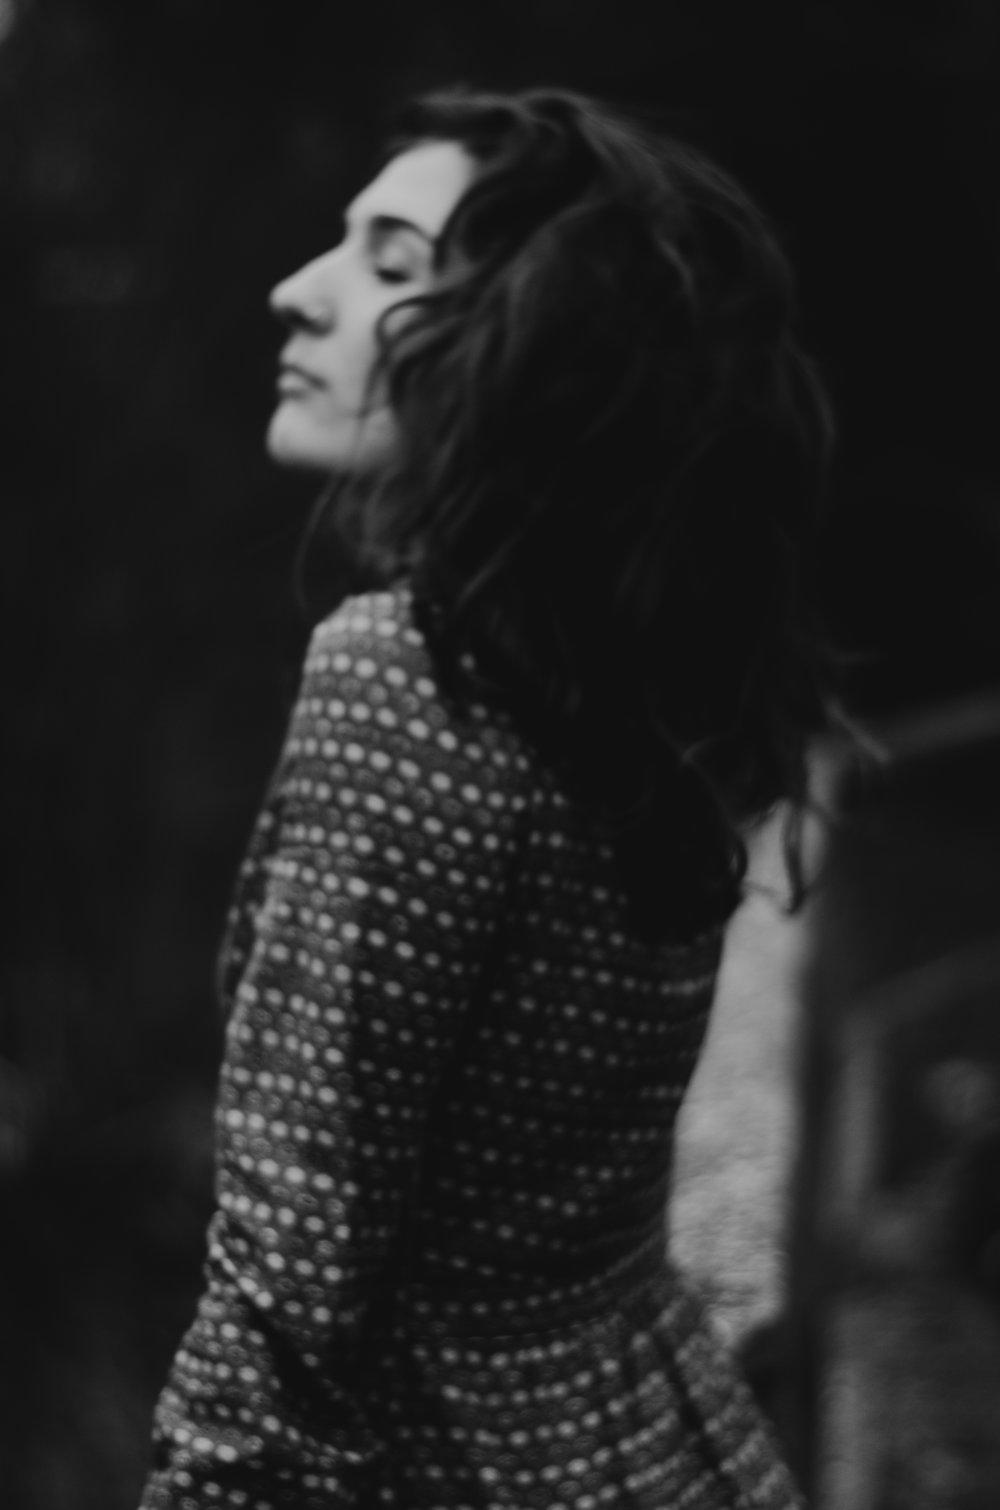 Chloe - Portraits - Aiste Saulyte Photography - 2018-01-05-38.jpg